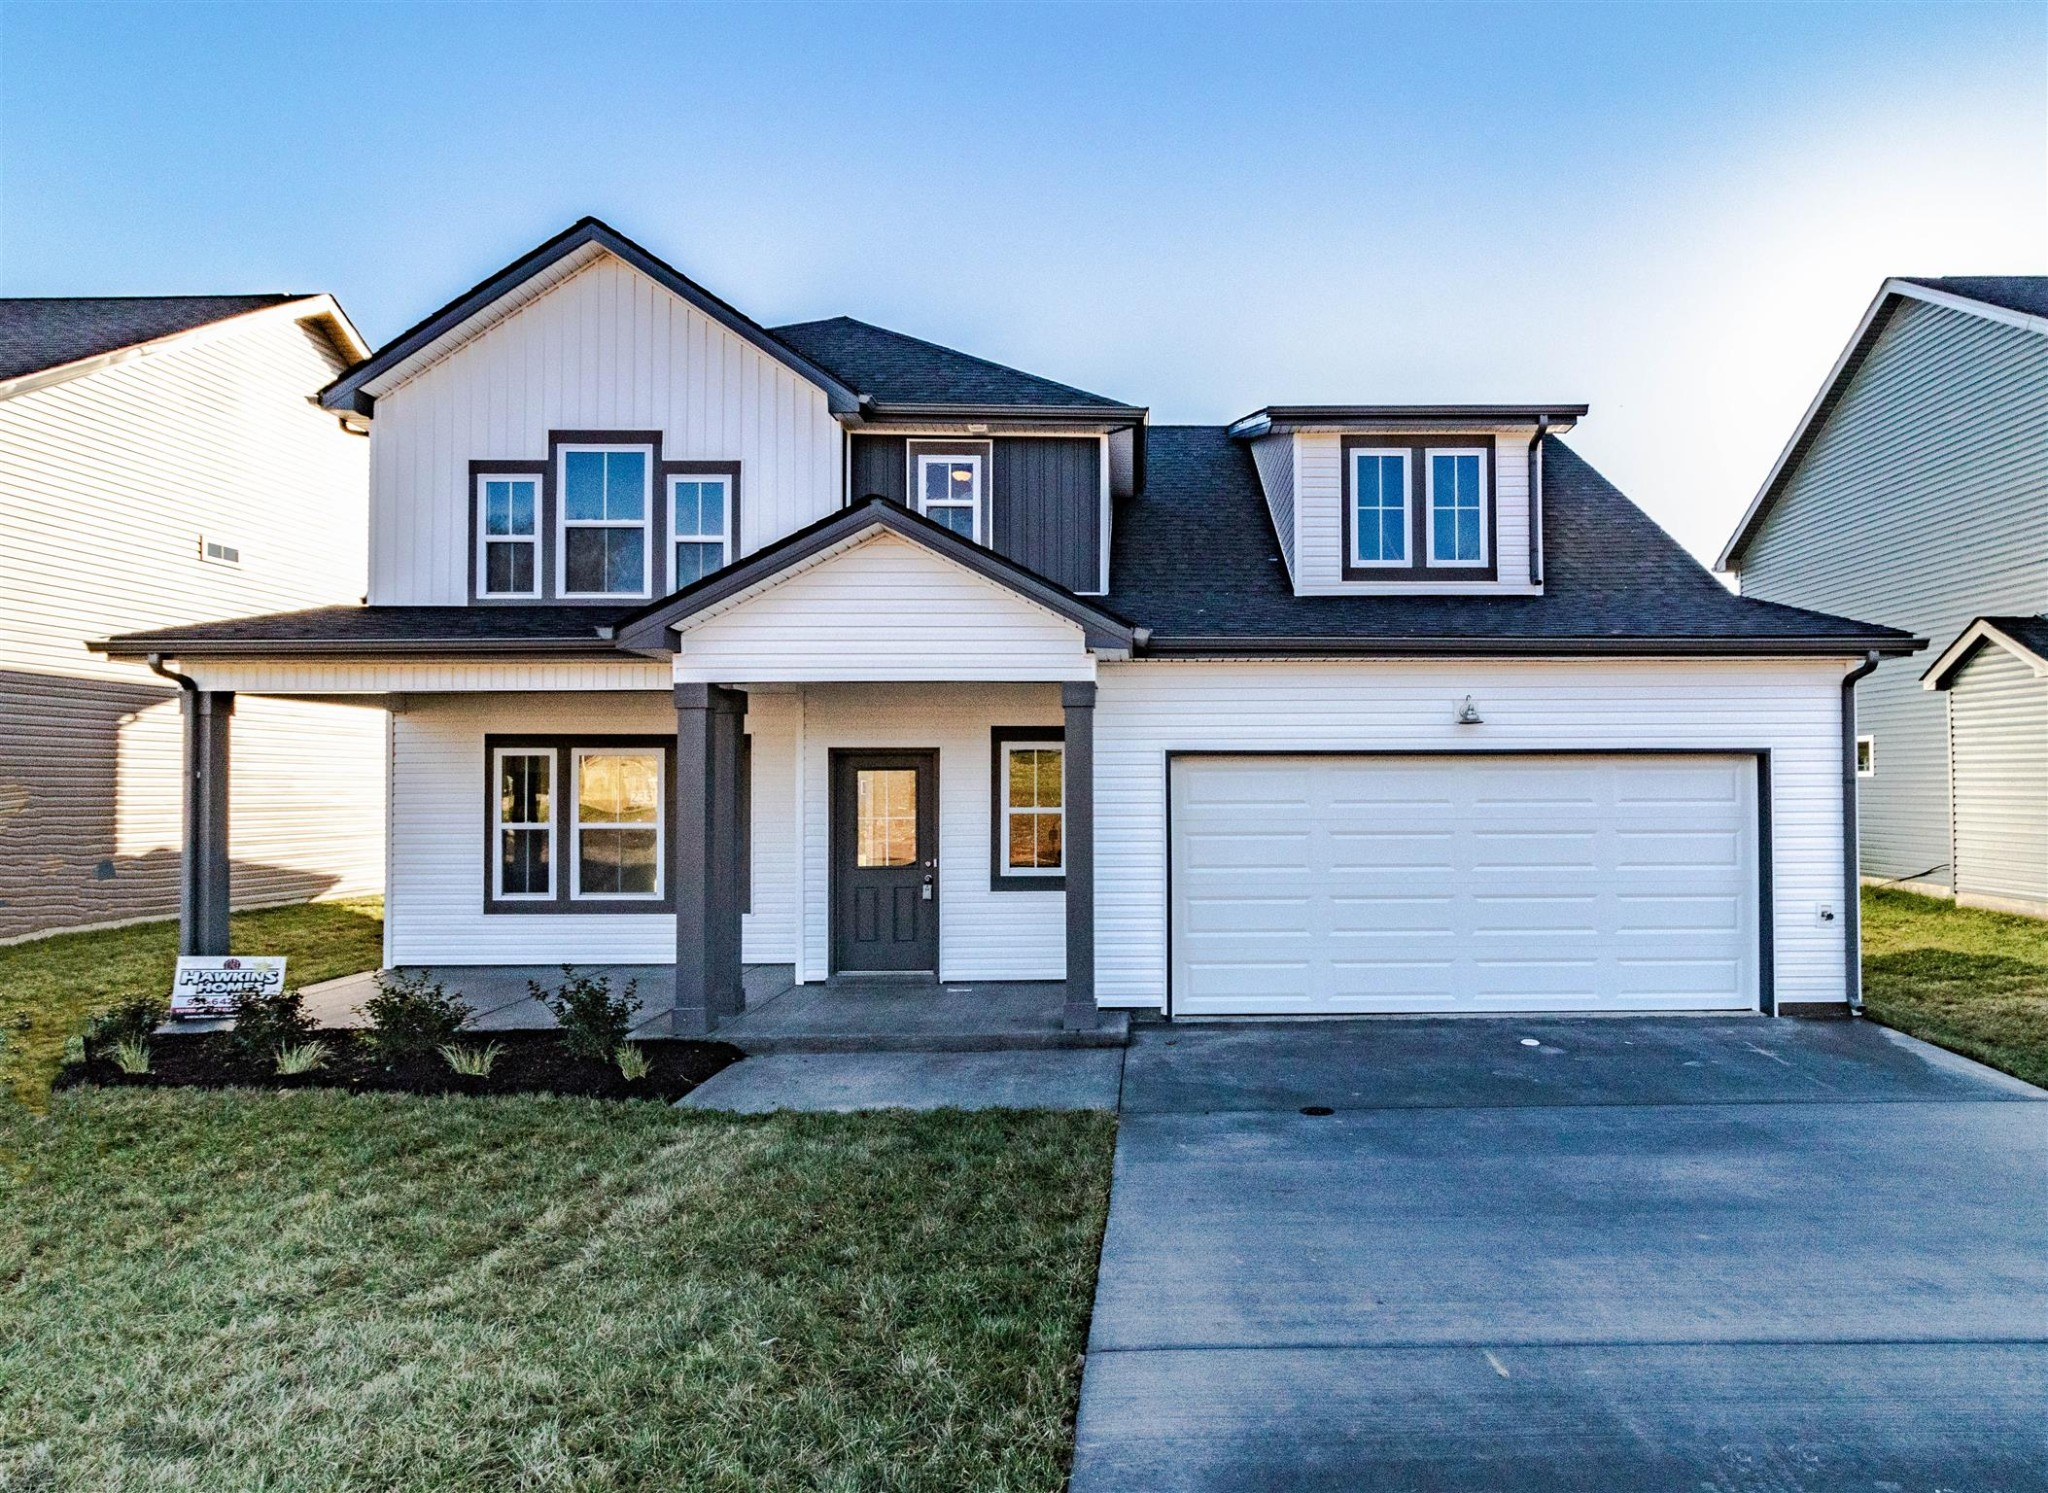 371 Eagles Bluff, Clarksville, TN 37040 - Clarksville, TN real estate listing